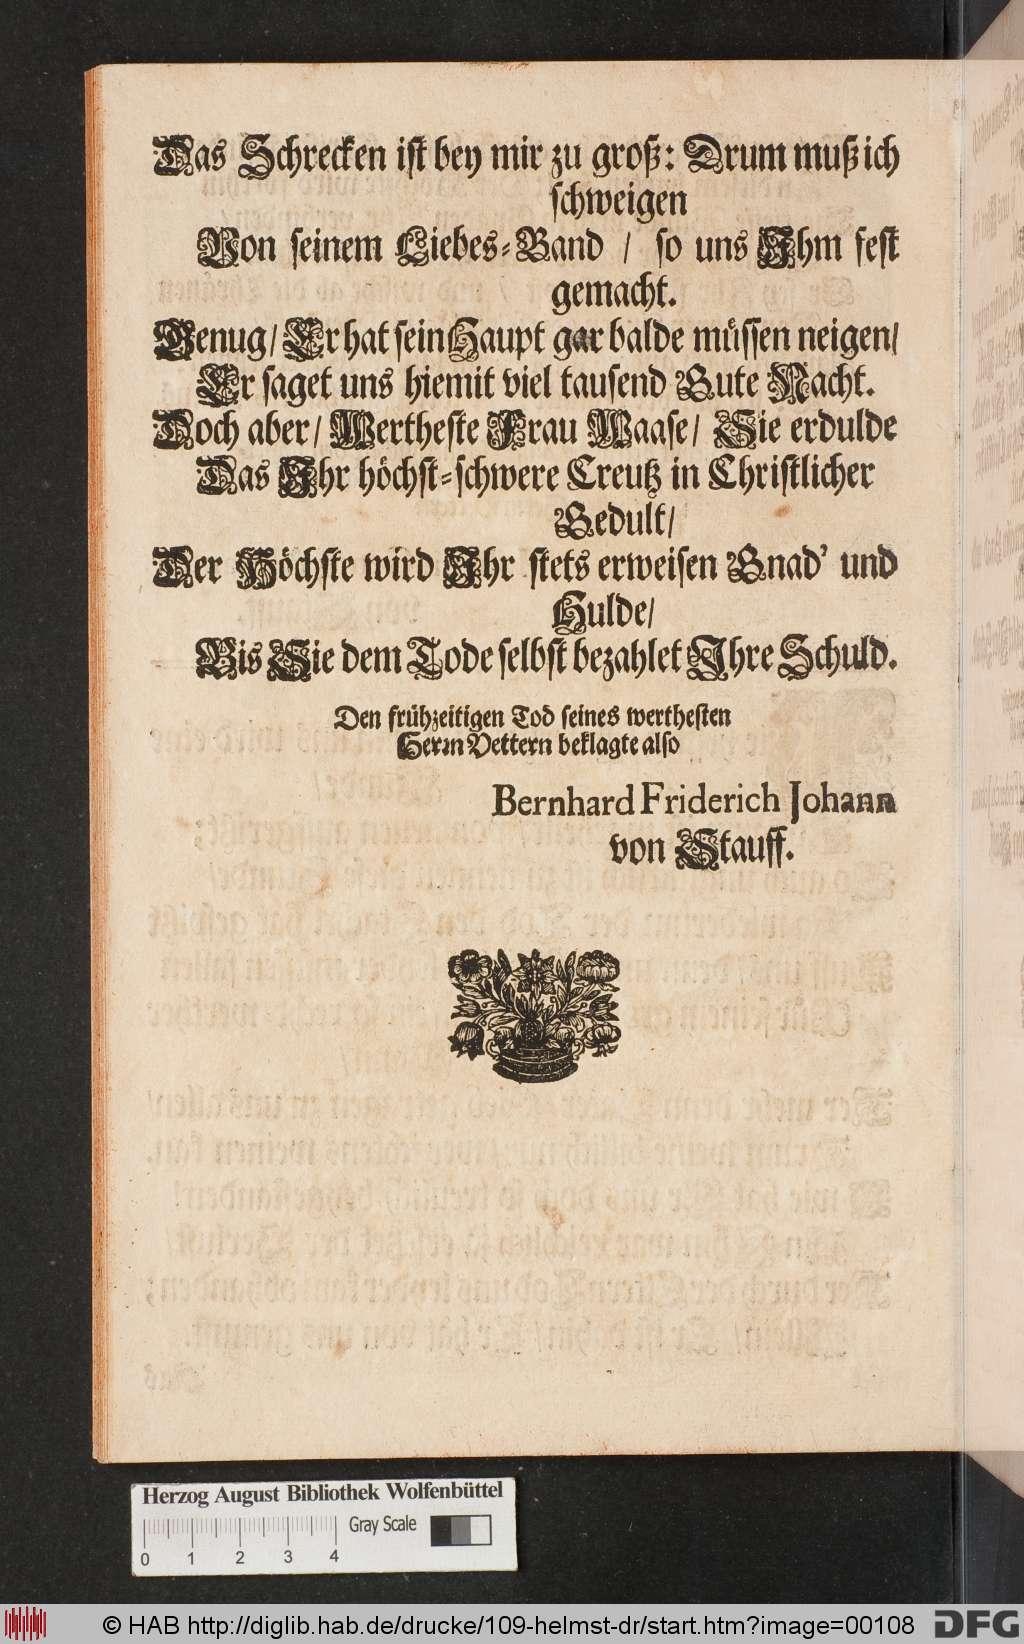 http://diglib.hab.de/drucke/109-helmst-dr/00108.jpg